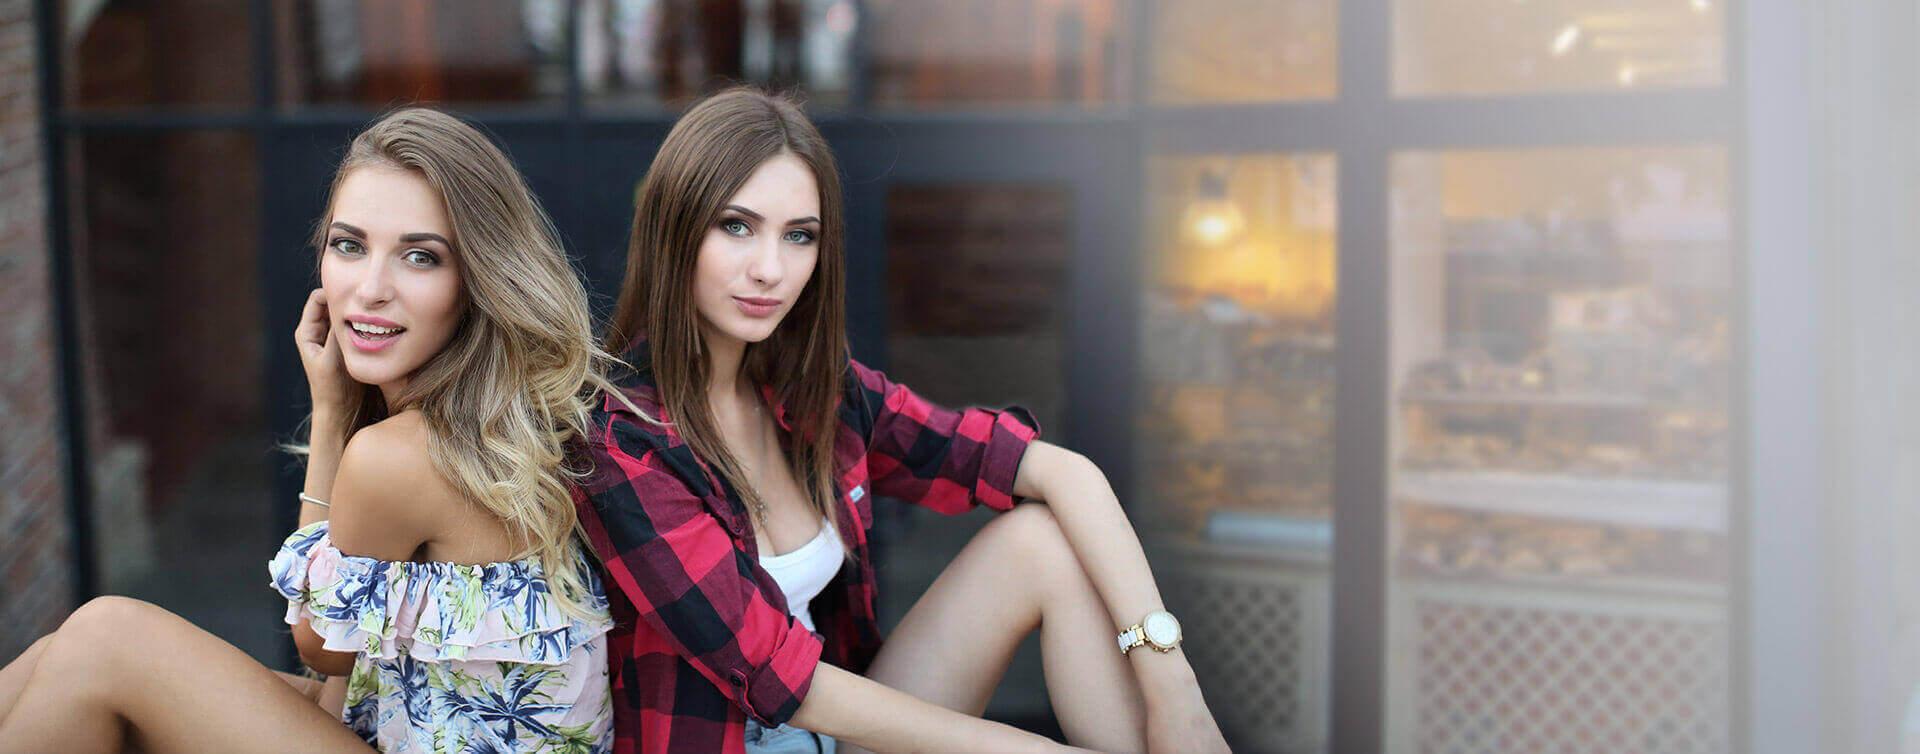 Russian Women & Girls - Elena's Models